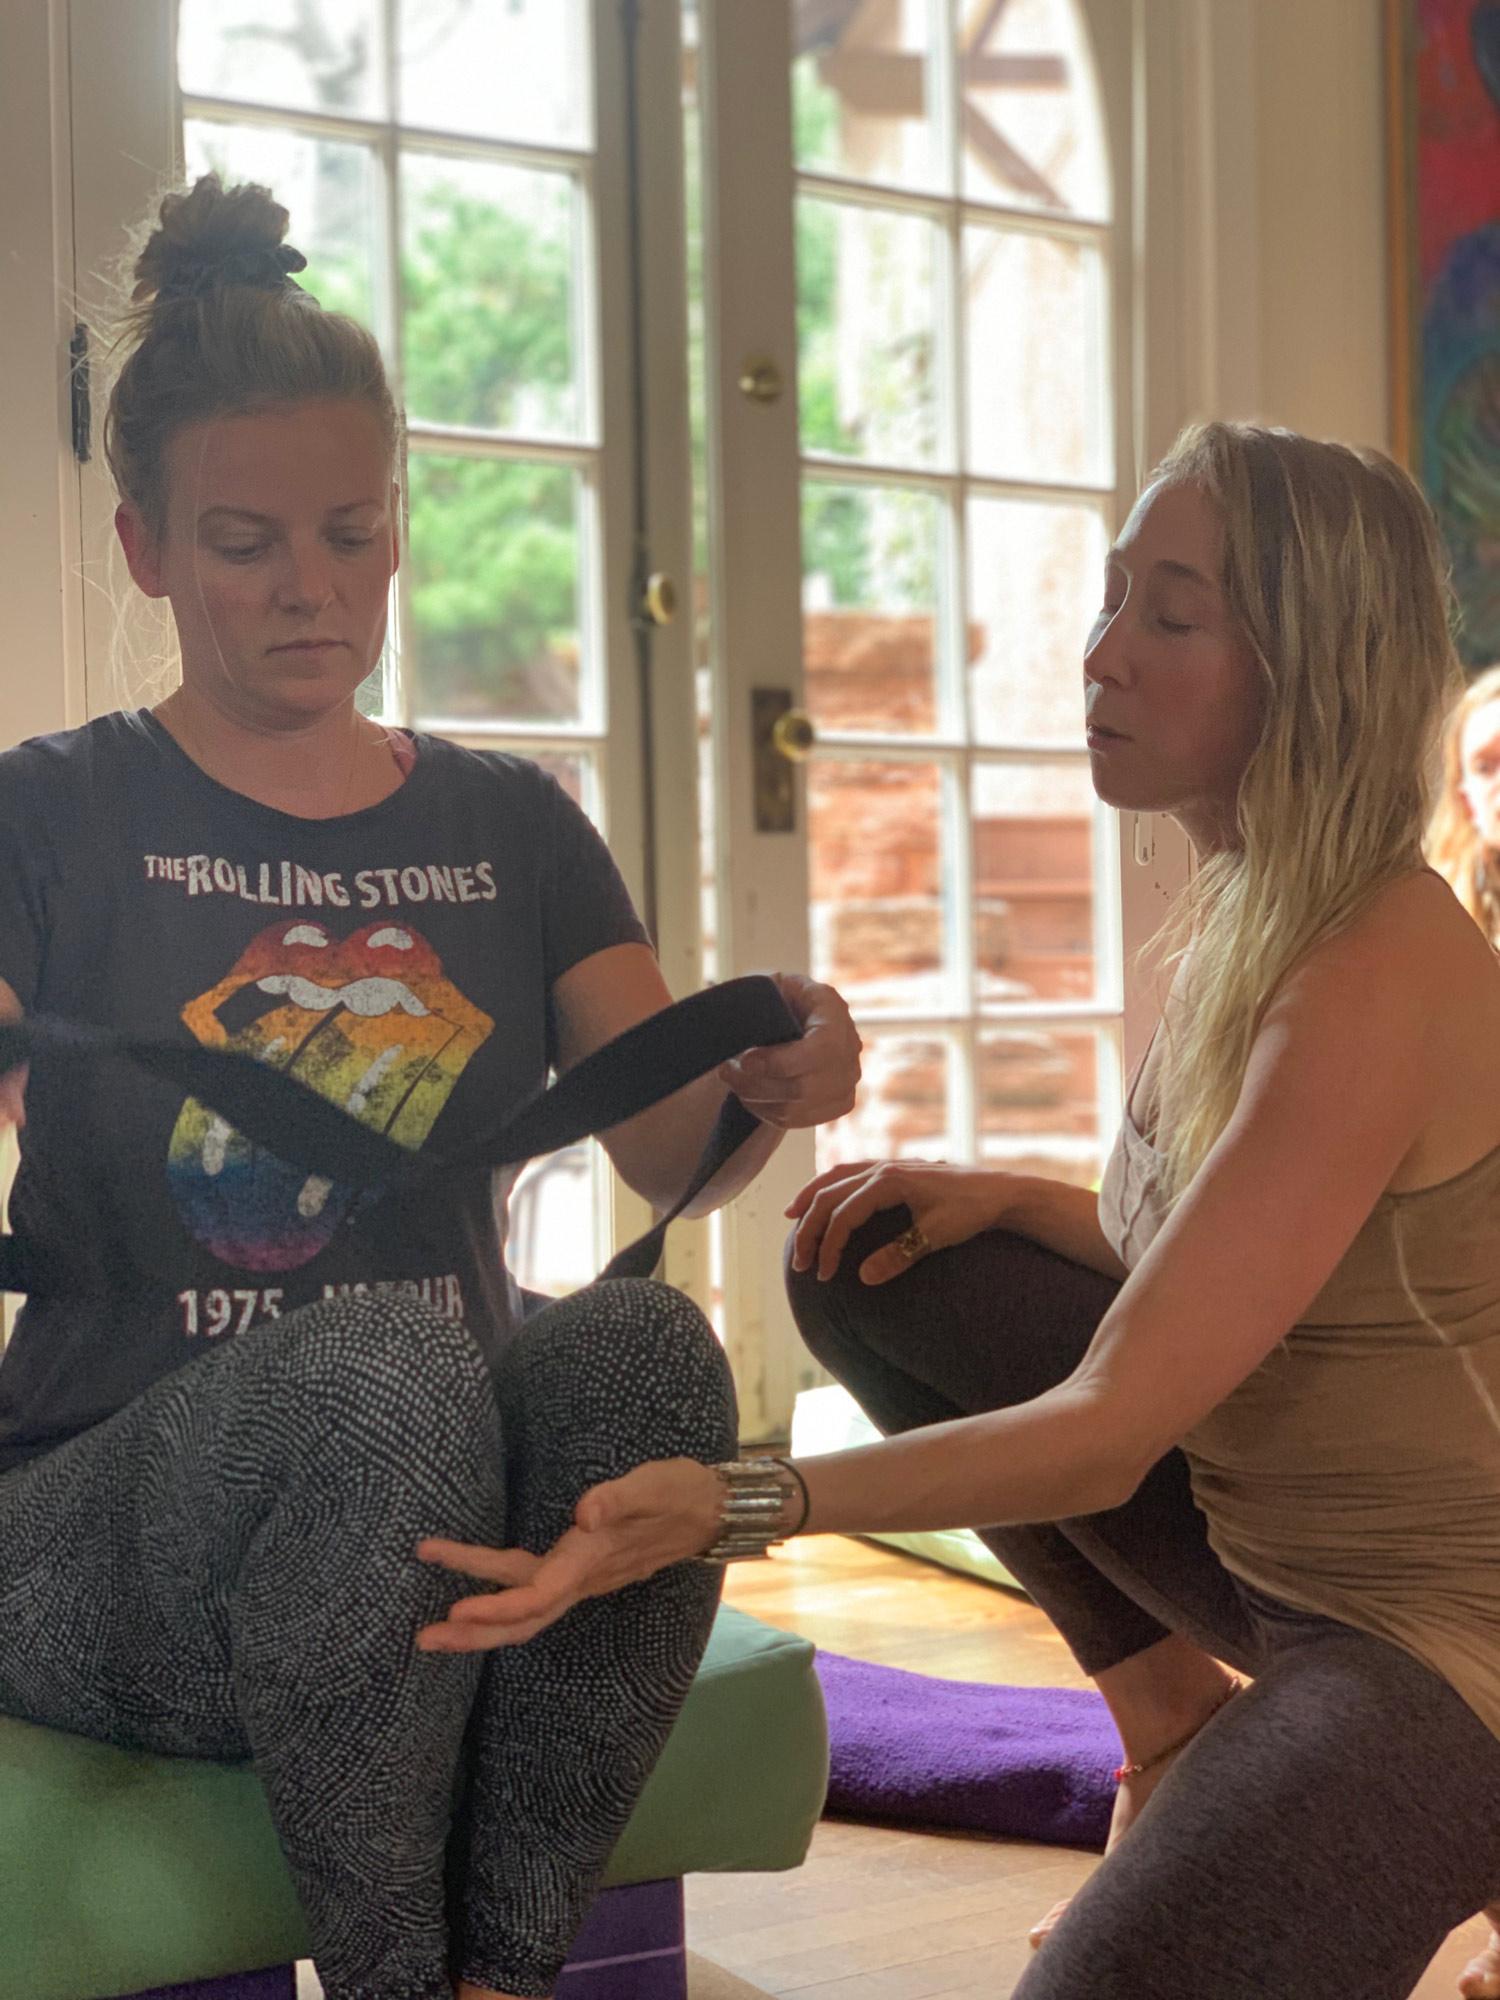 durga-excursions-yin-yoga-teacher-training-manitou-colorado-12.jpg